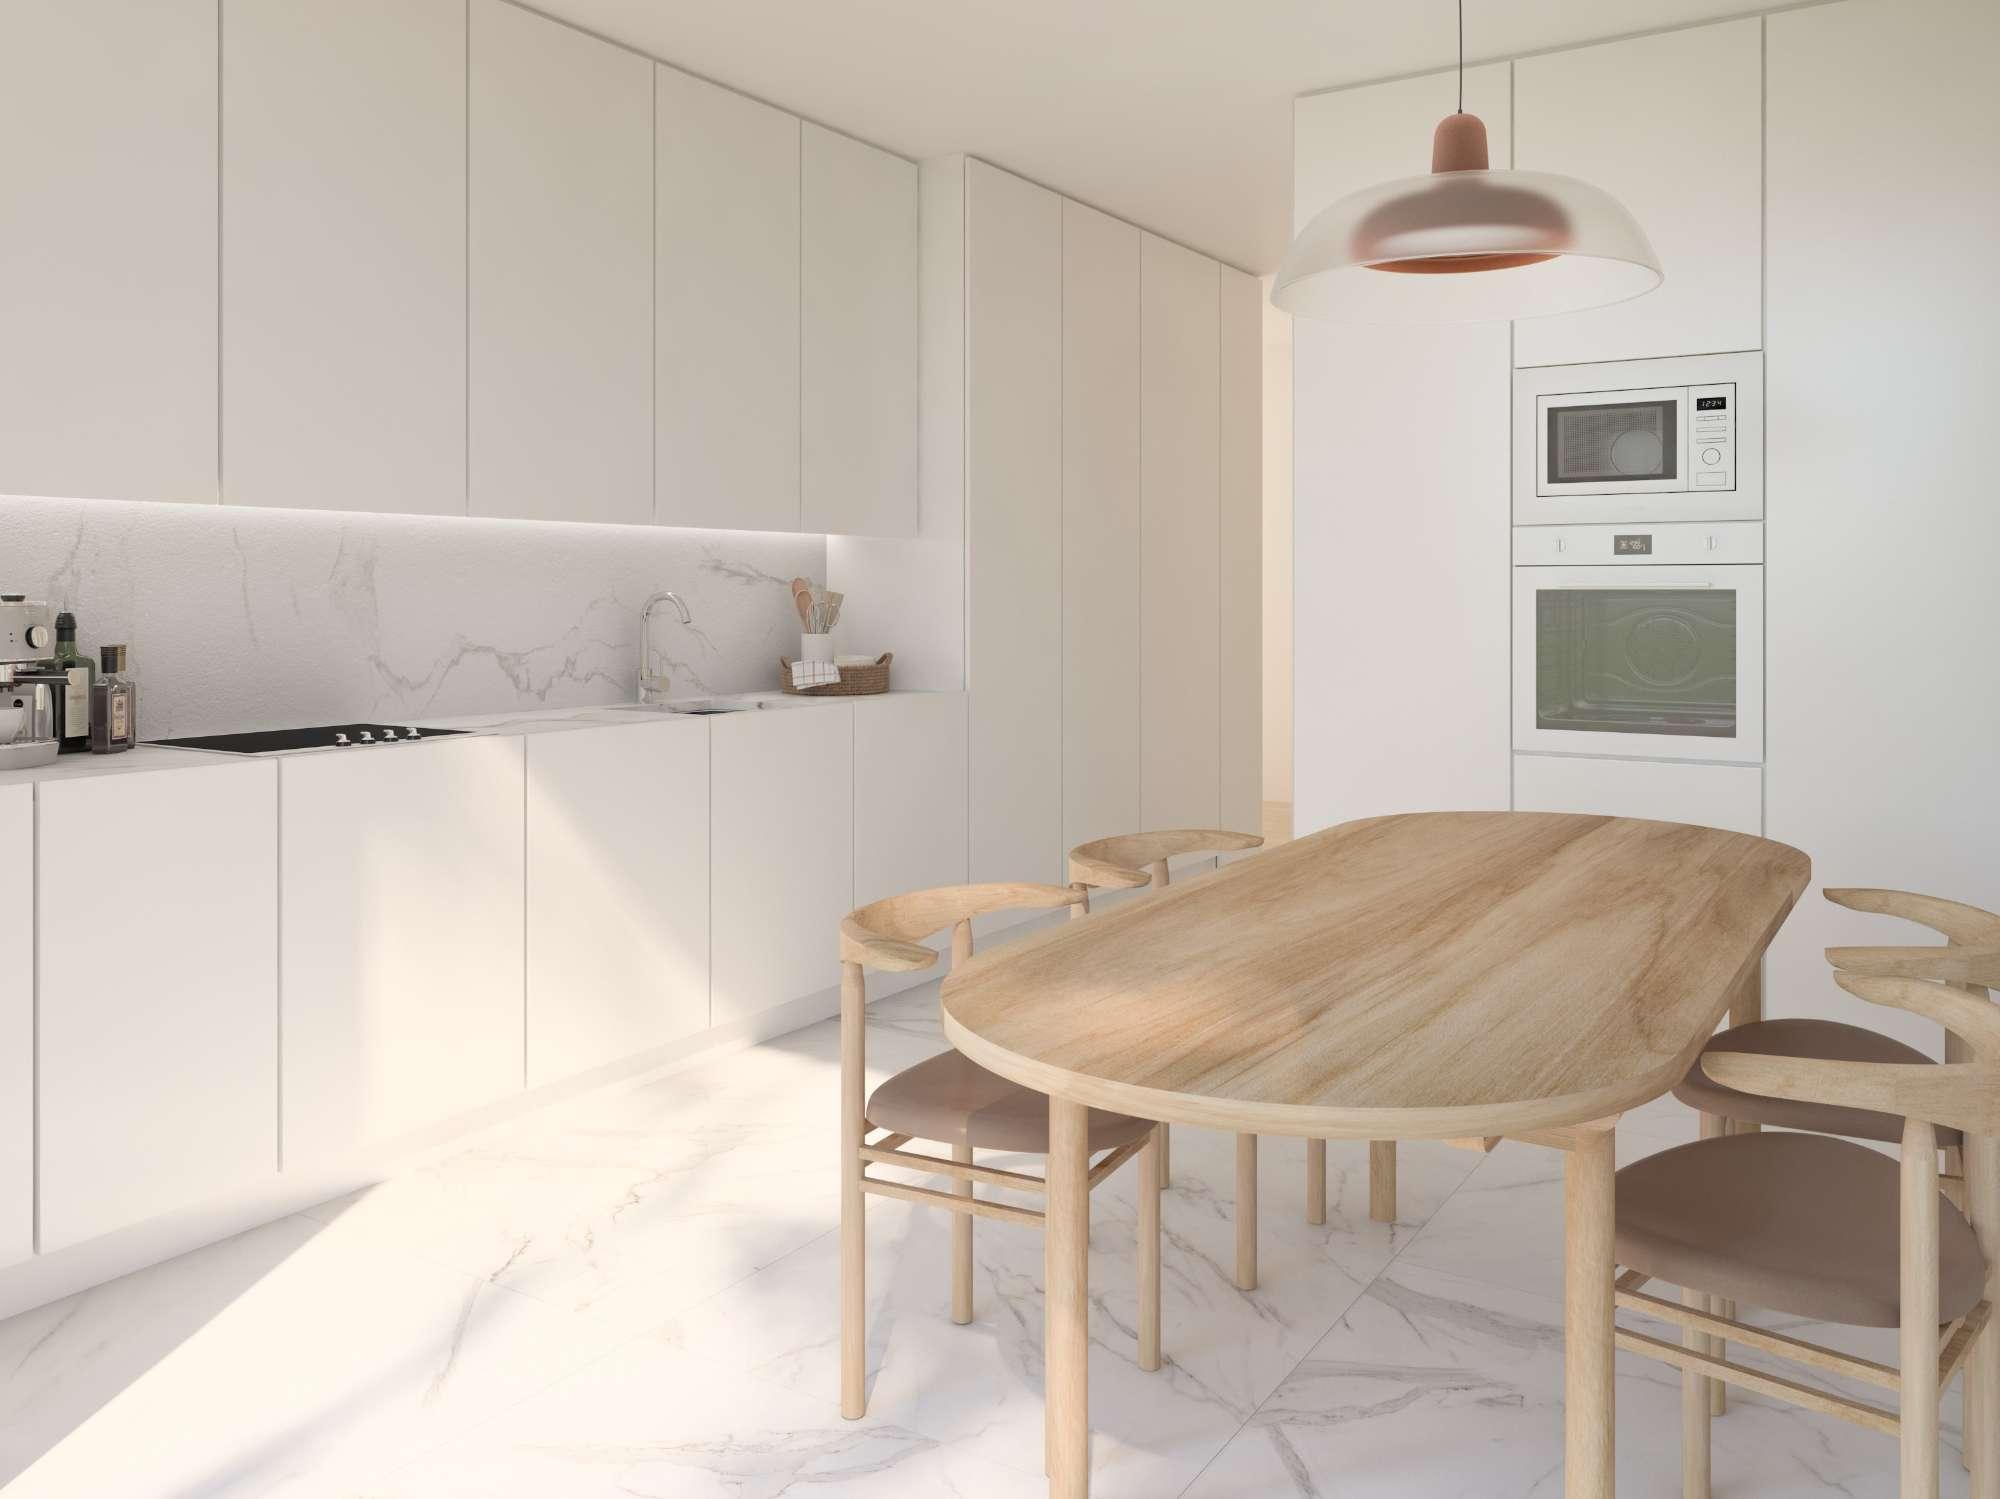 images-prod-prop-023424-the_coral_kitchen_1628079192106-jpg